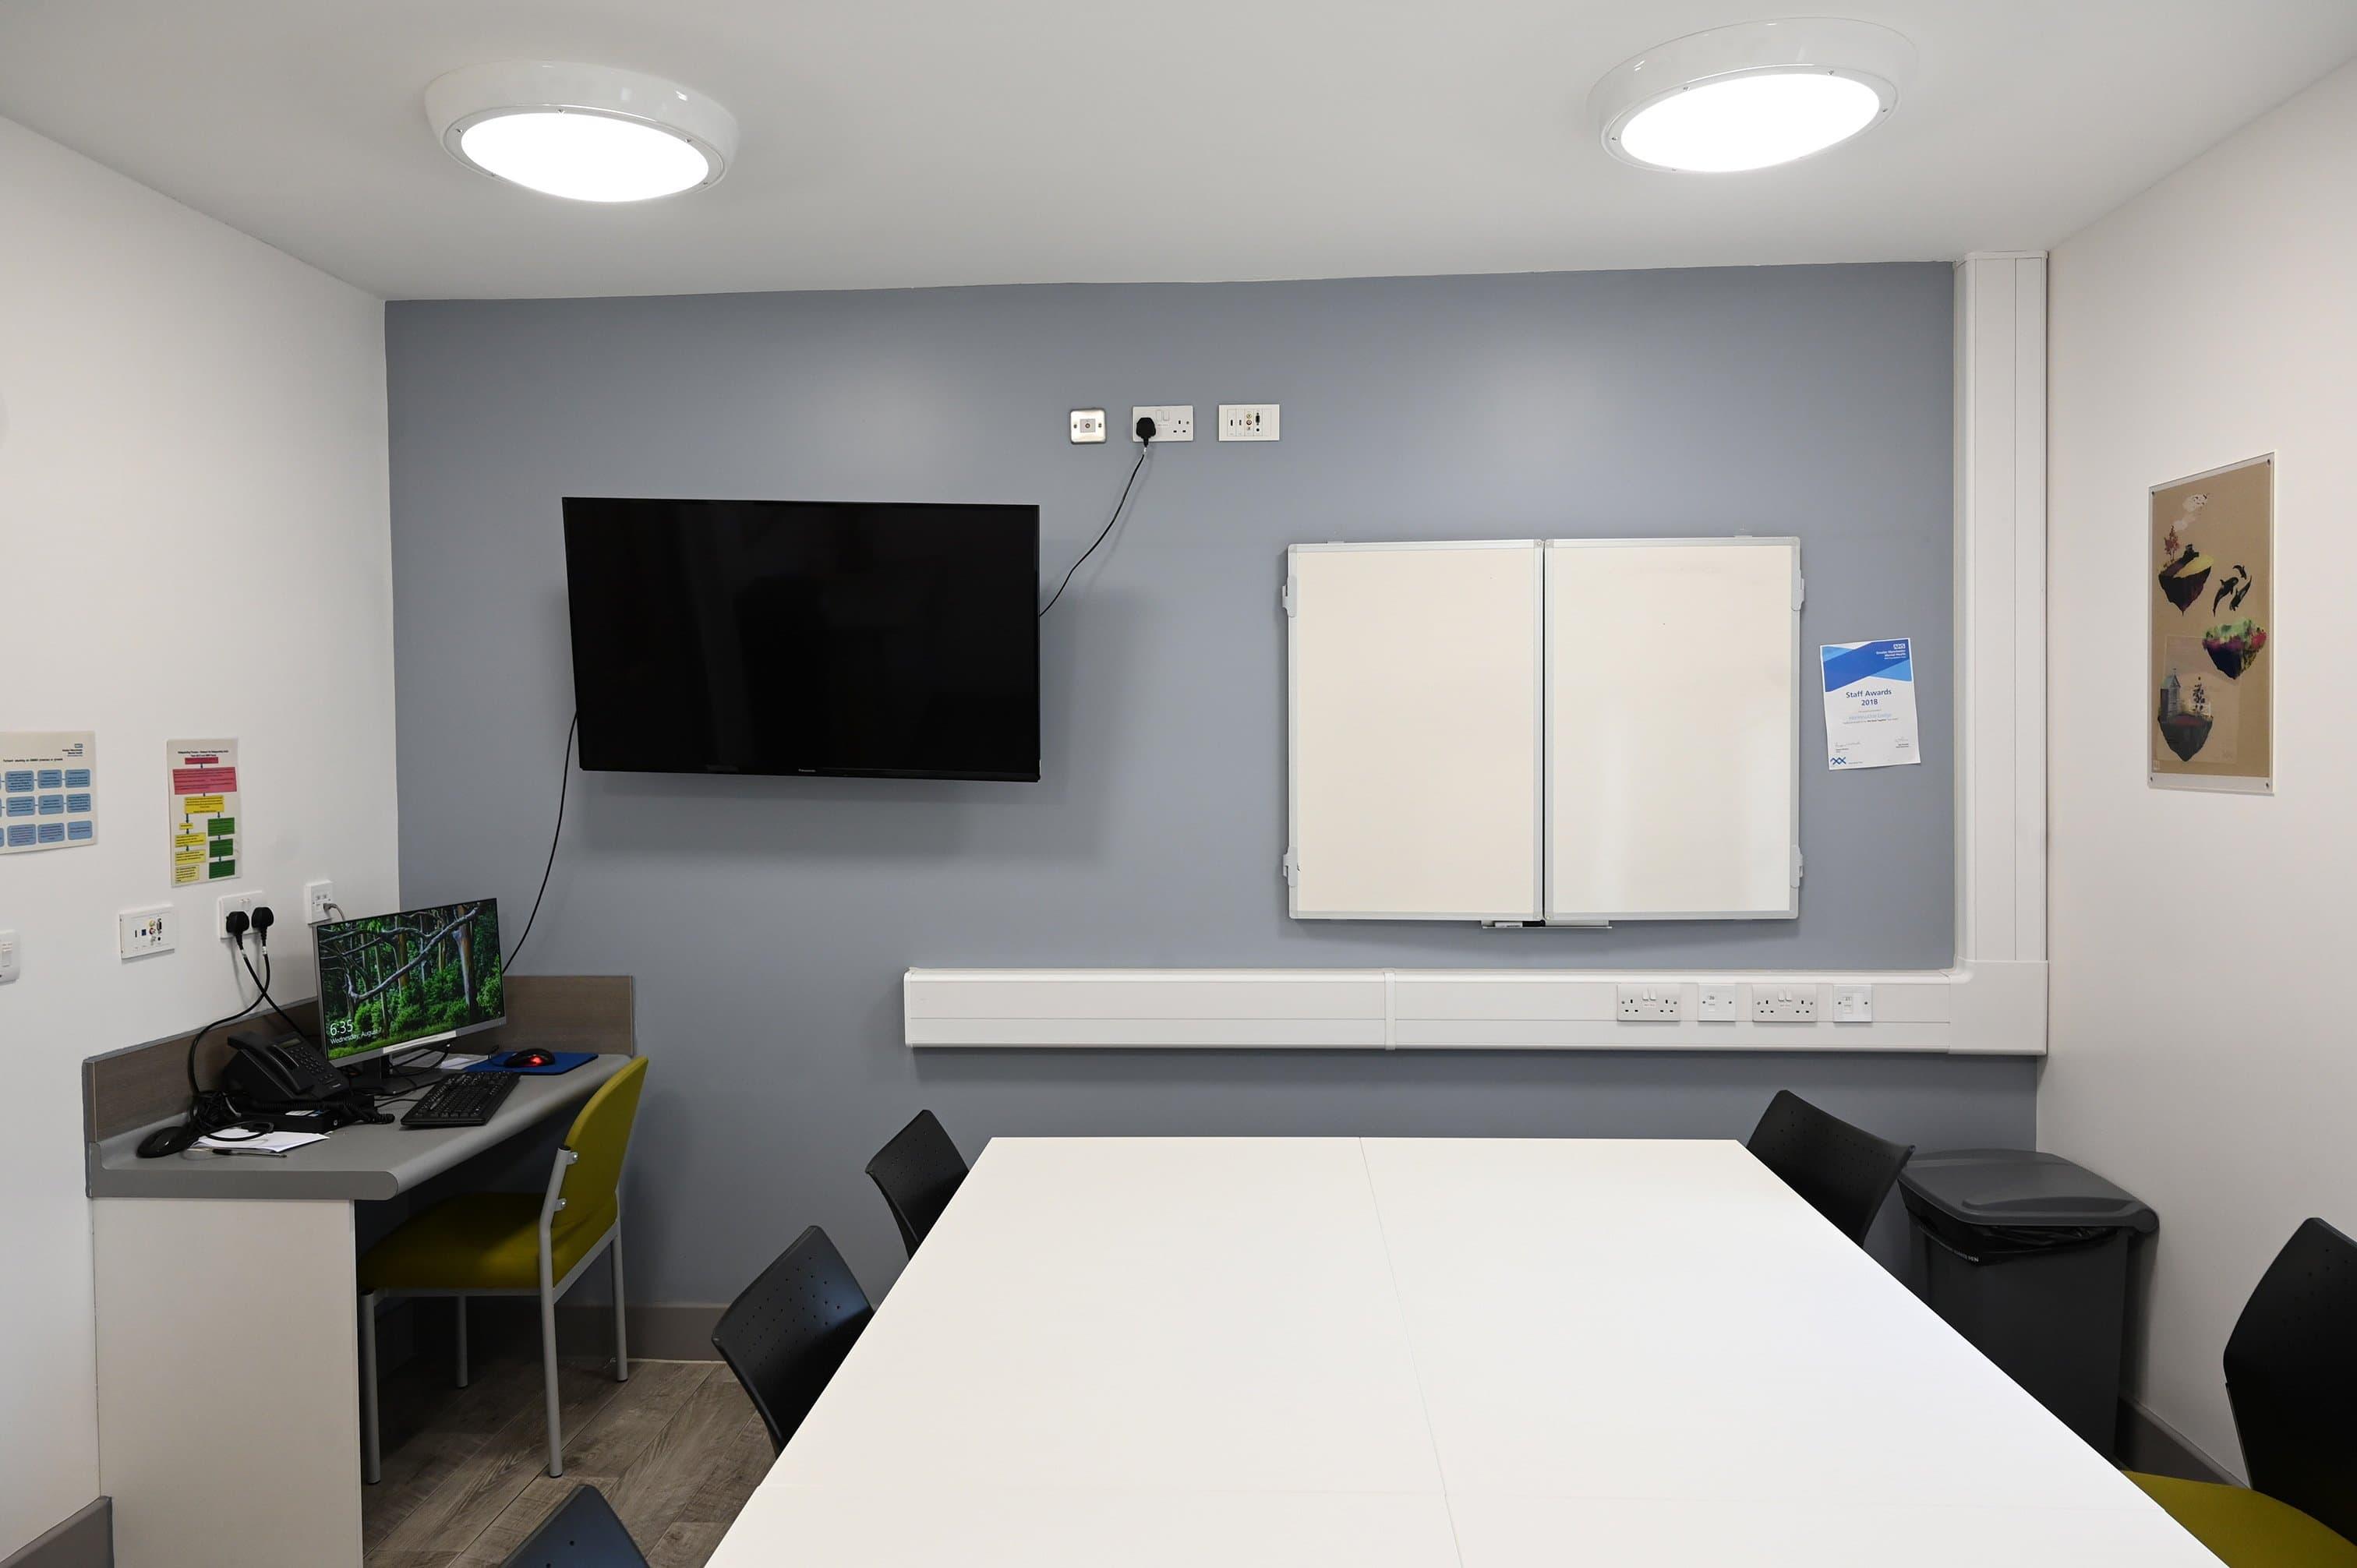 Honeysuckle Lodge - Group Room (7)